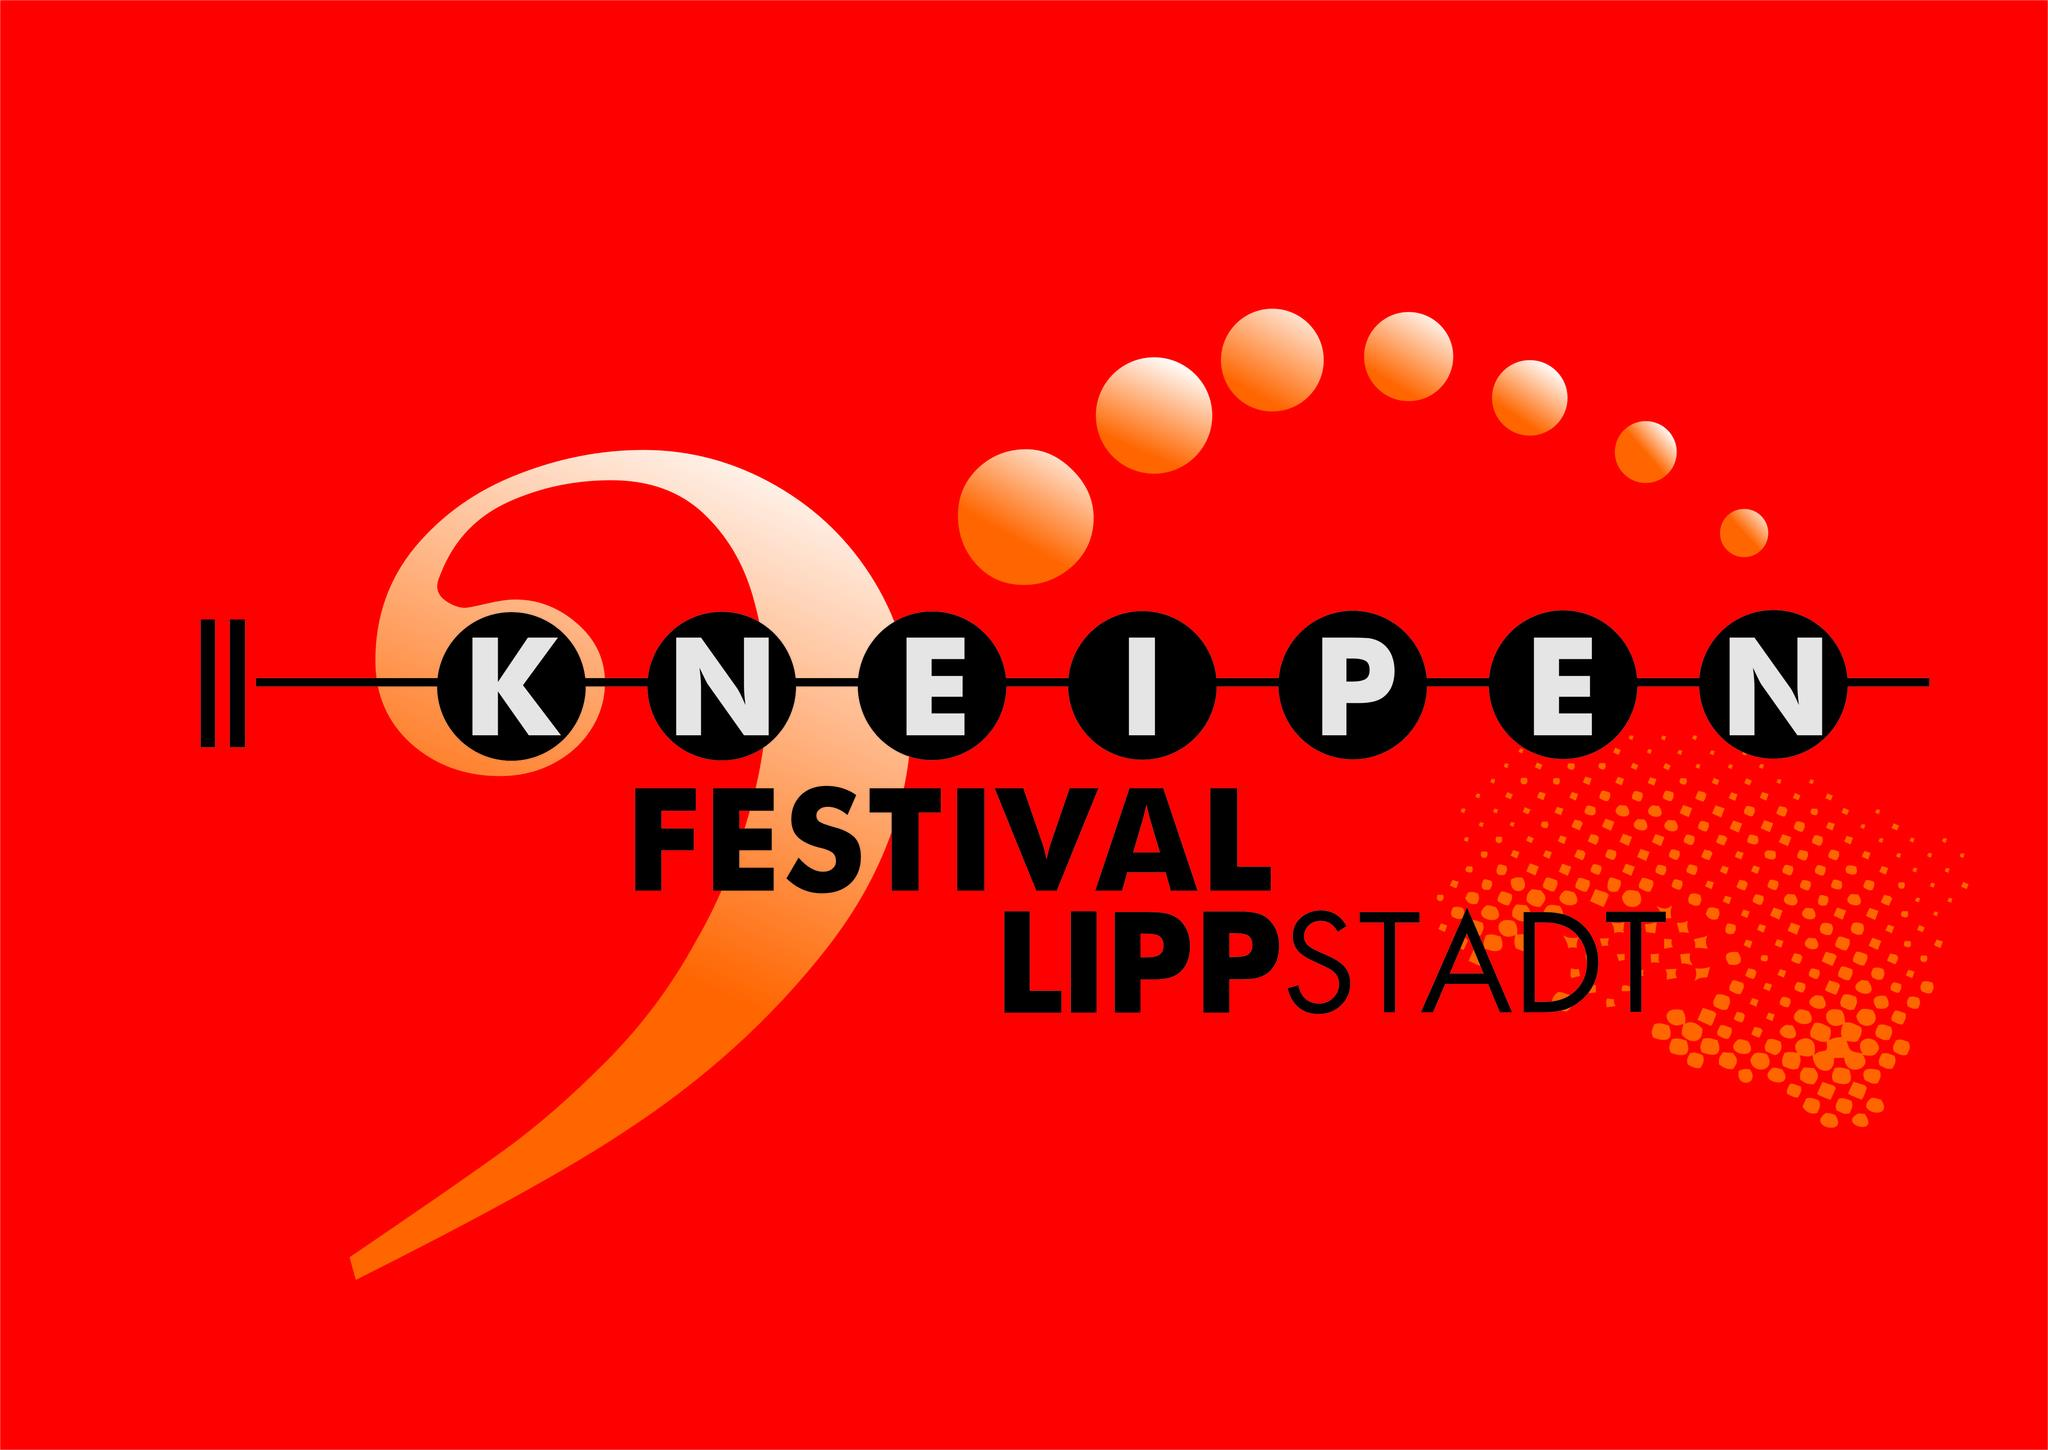 Lippstädter Kneipenfestival